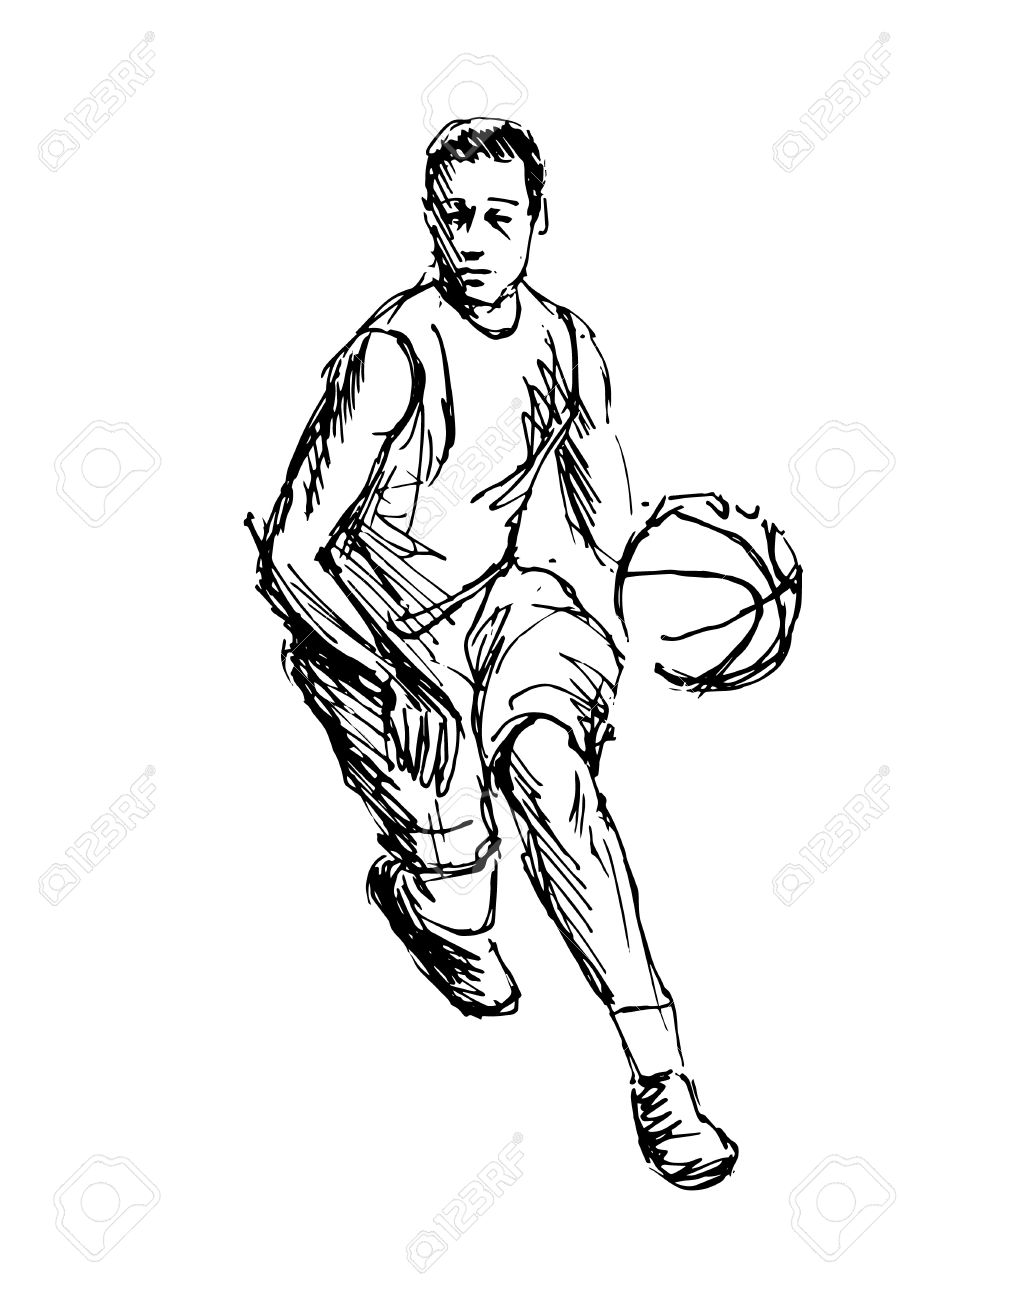 hand sketch basketball player vector illustration royalty free